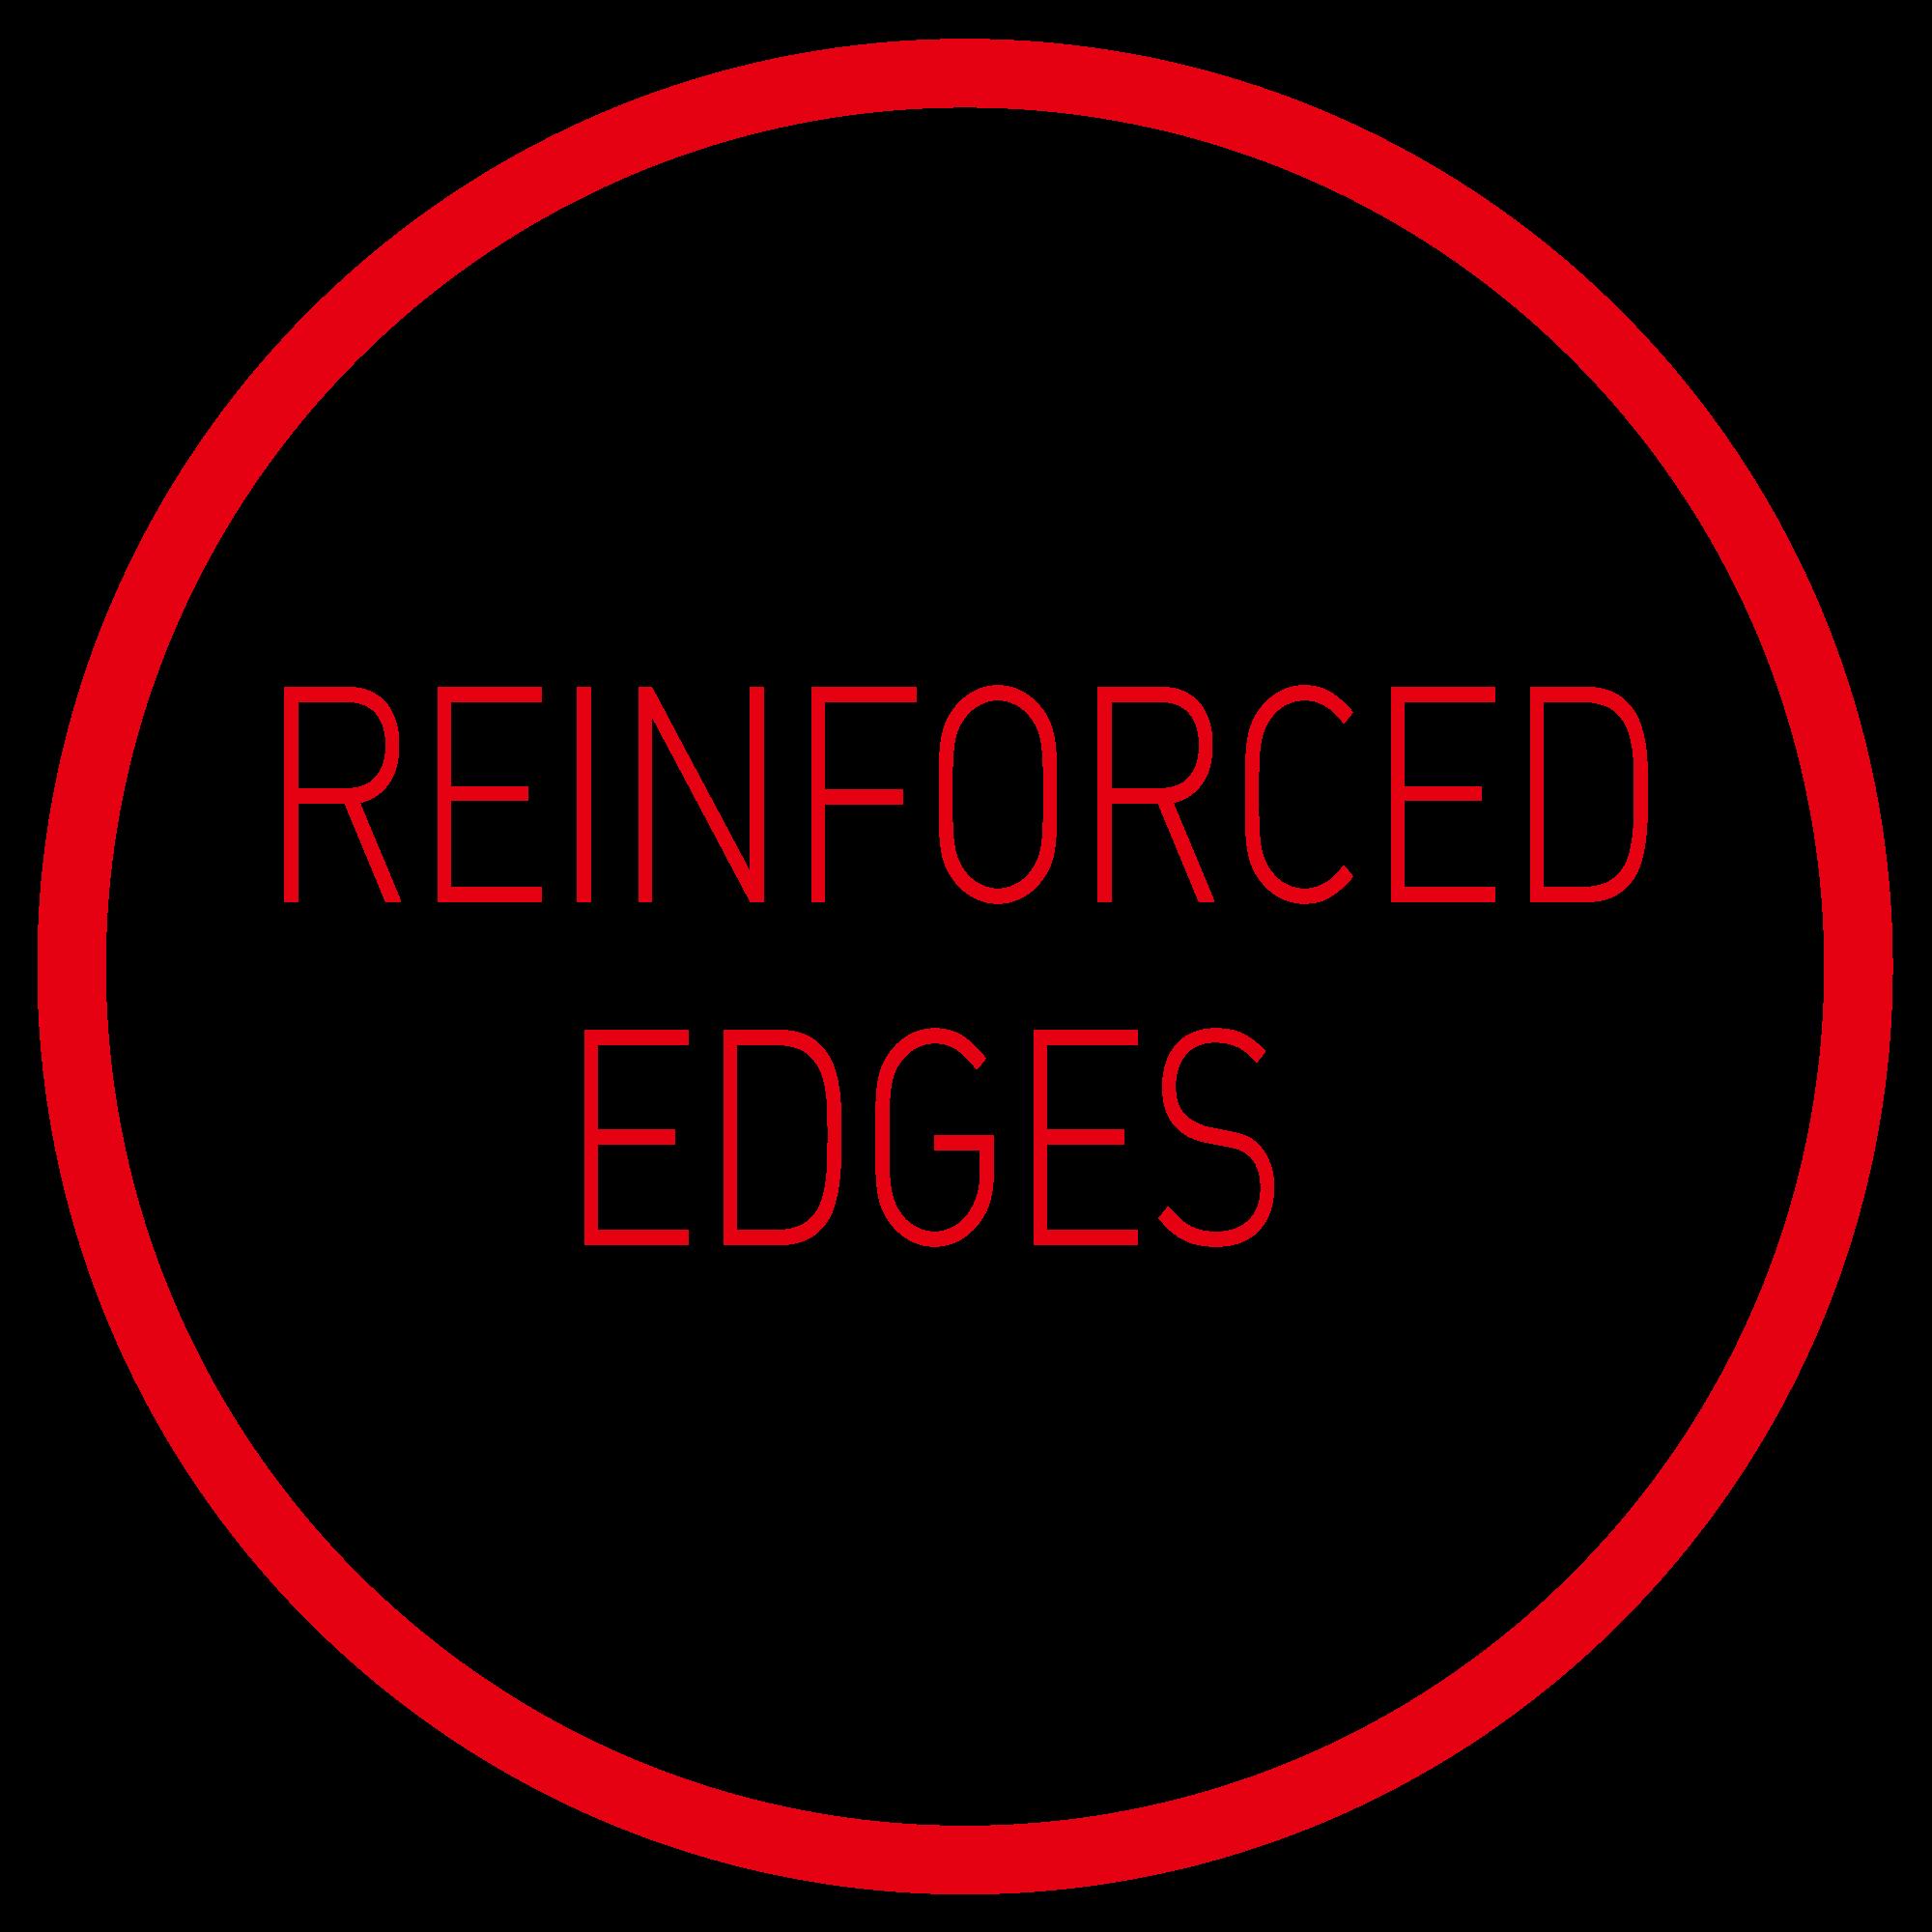 Selle-Italia-icon-15-reinforced-edges